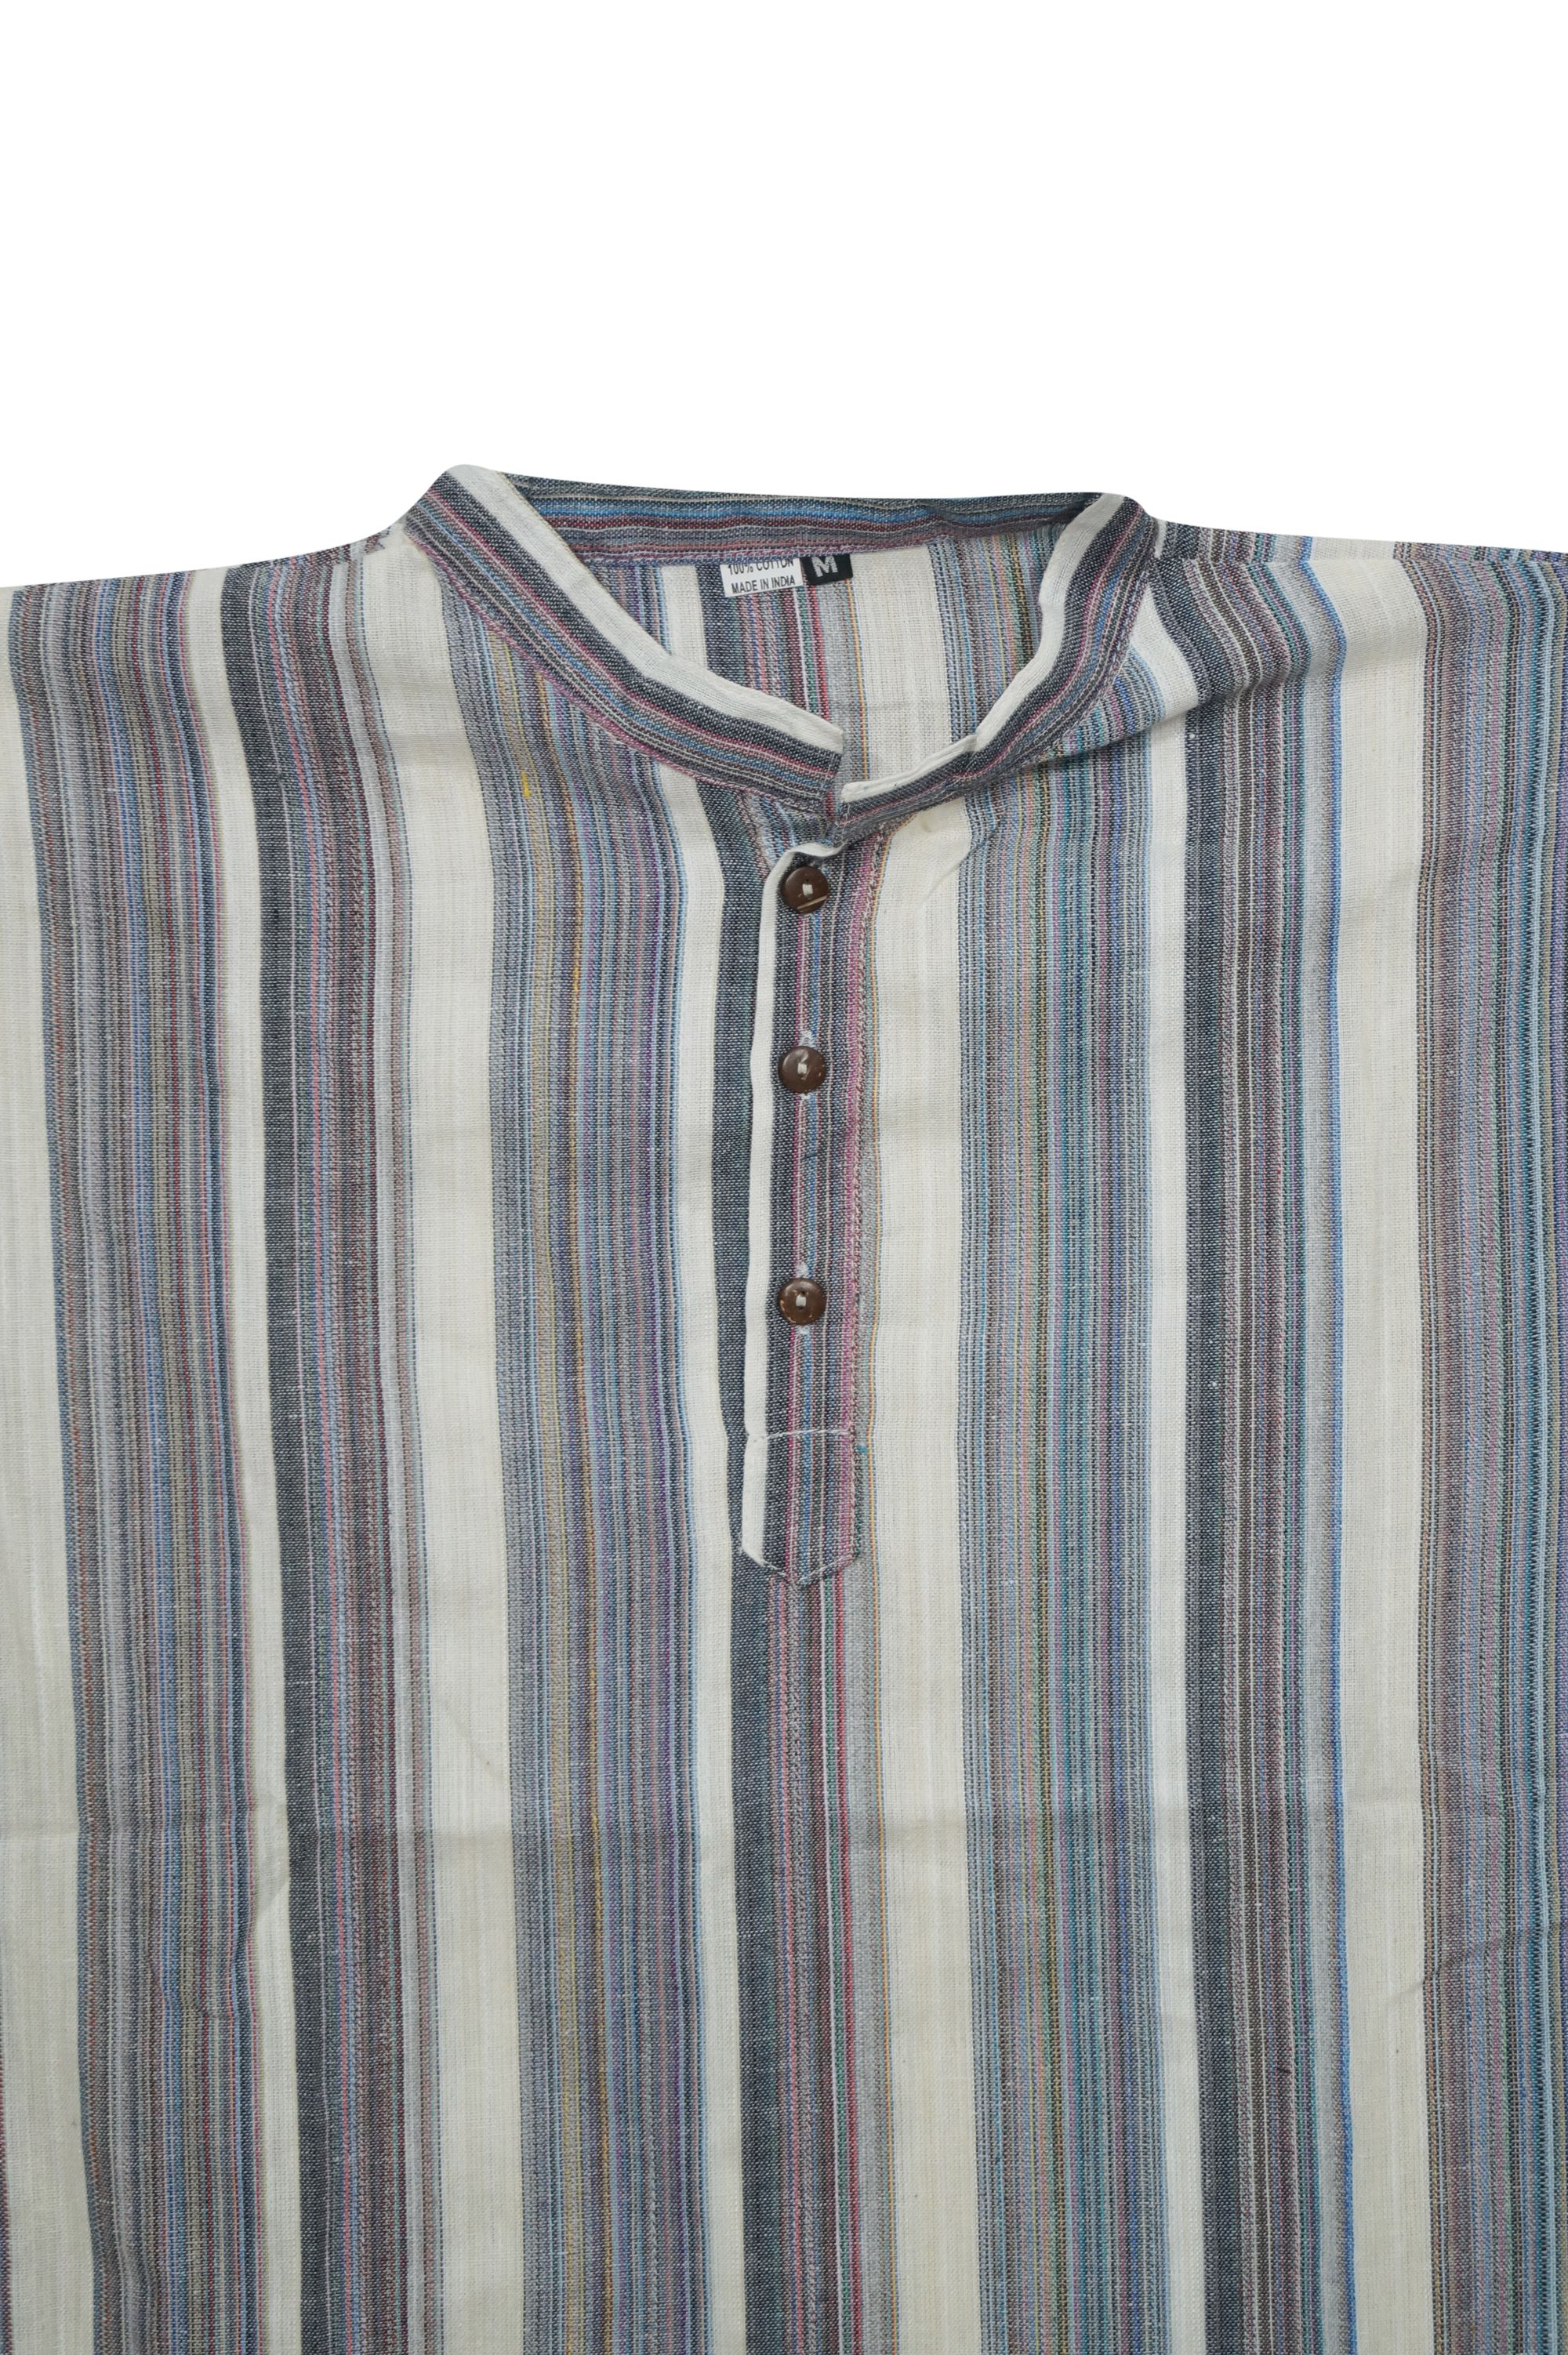 609655f846 Mogul Mens Ethnic Indian Fashion Shirt Short Kurta Trendy Cotton Tunic  Traditional Apparel L - Walmart.com